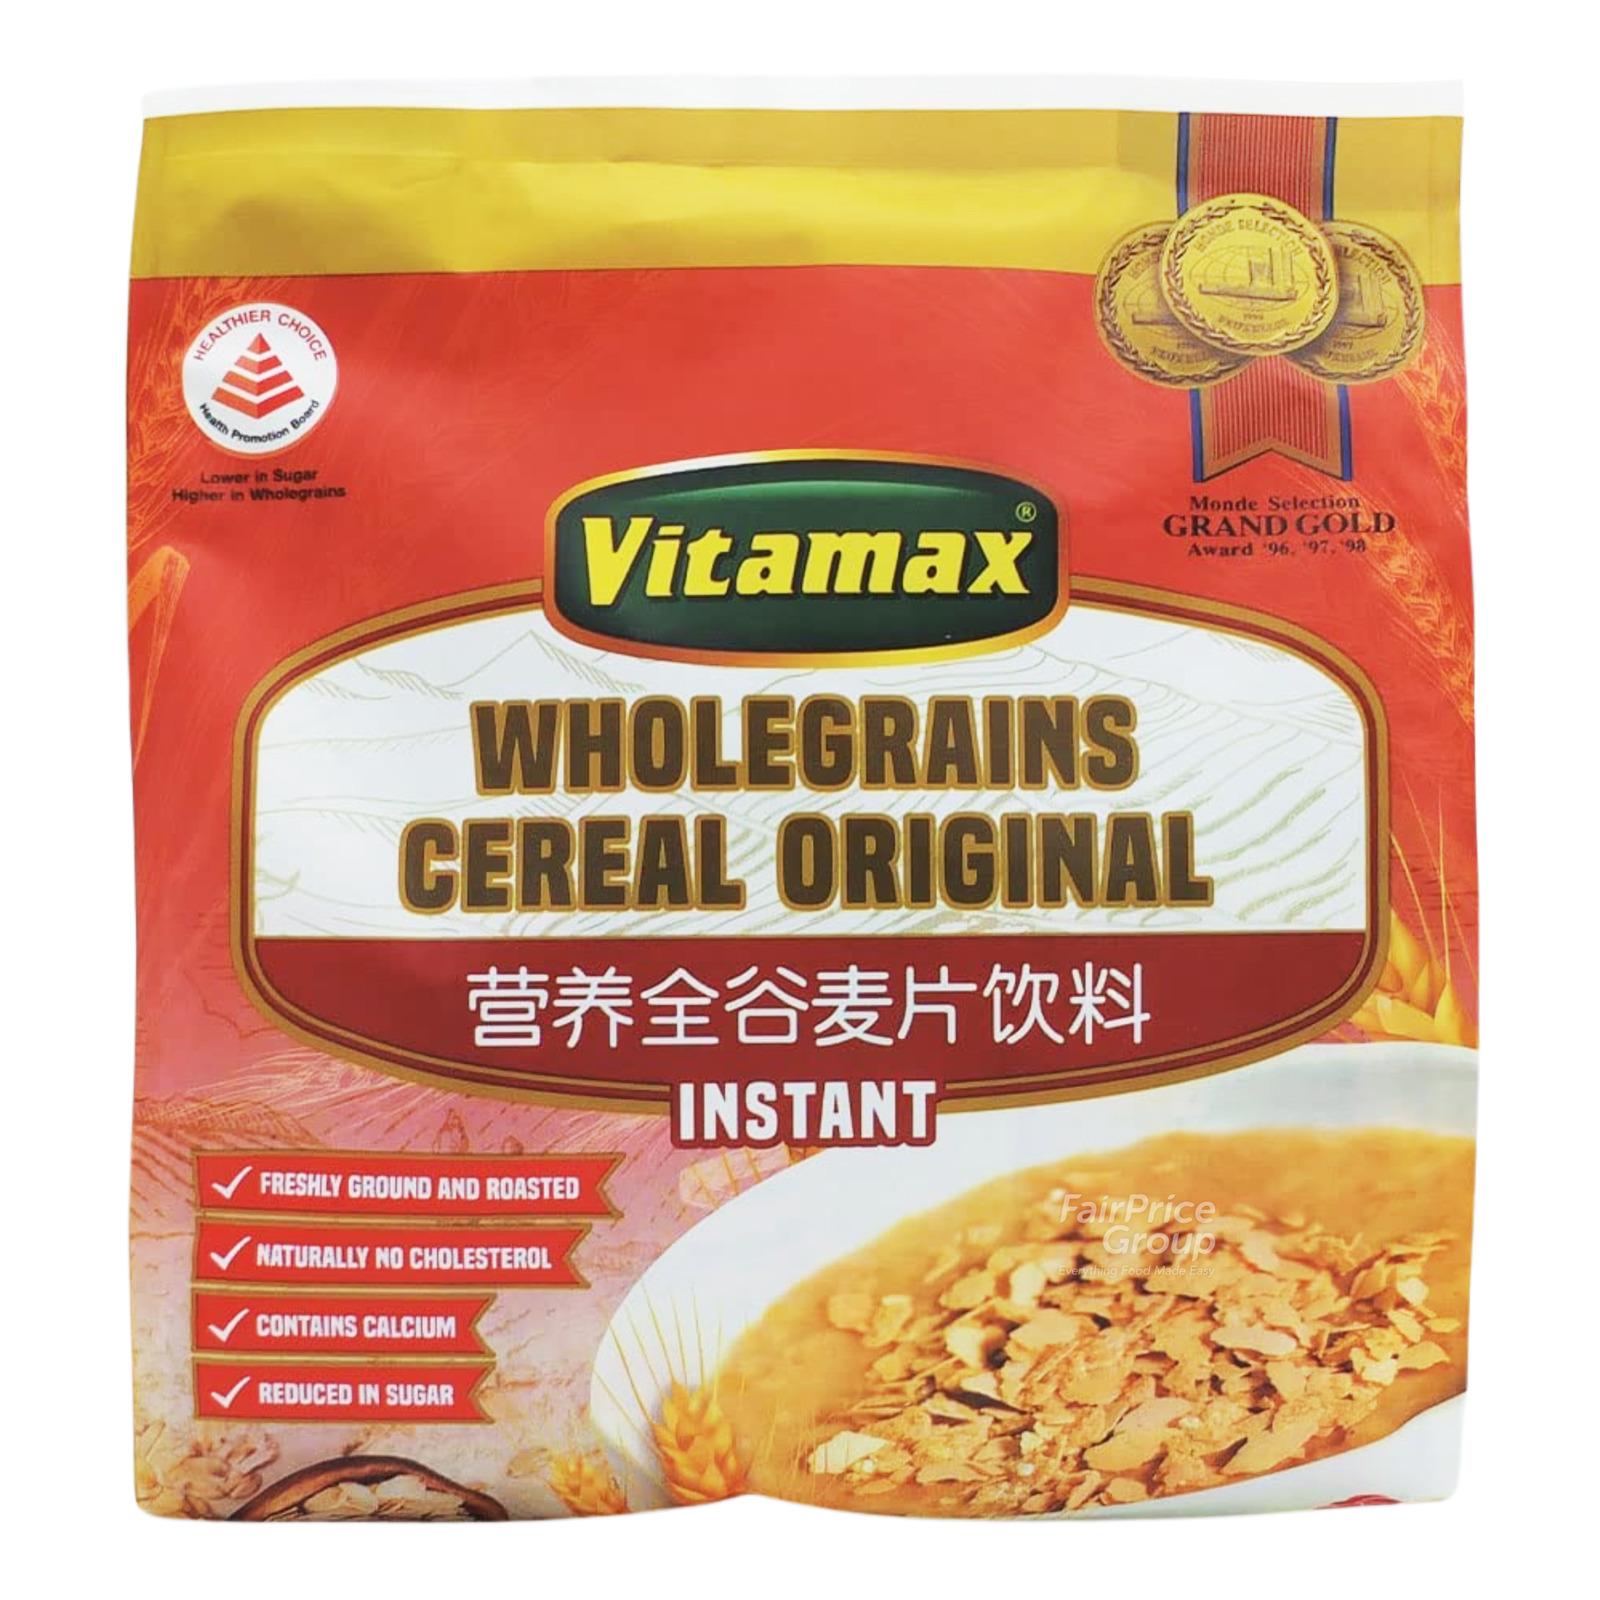 Vitamax Instant Wholegrains Cereal Drink - Original